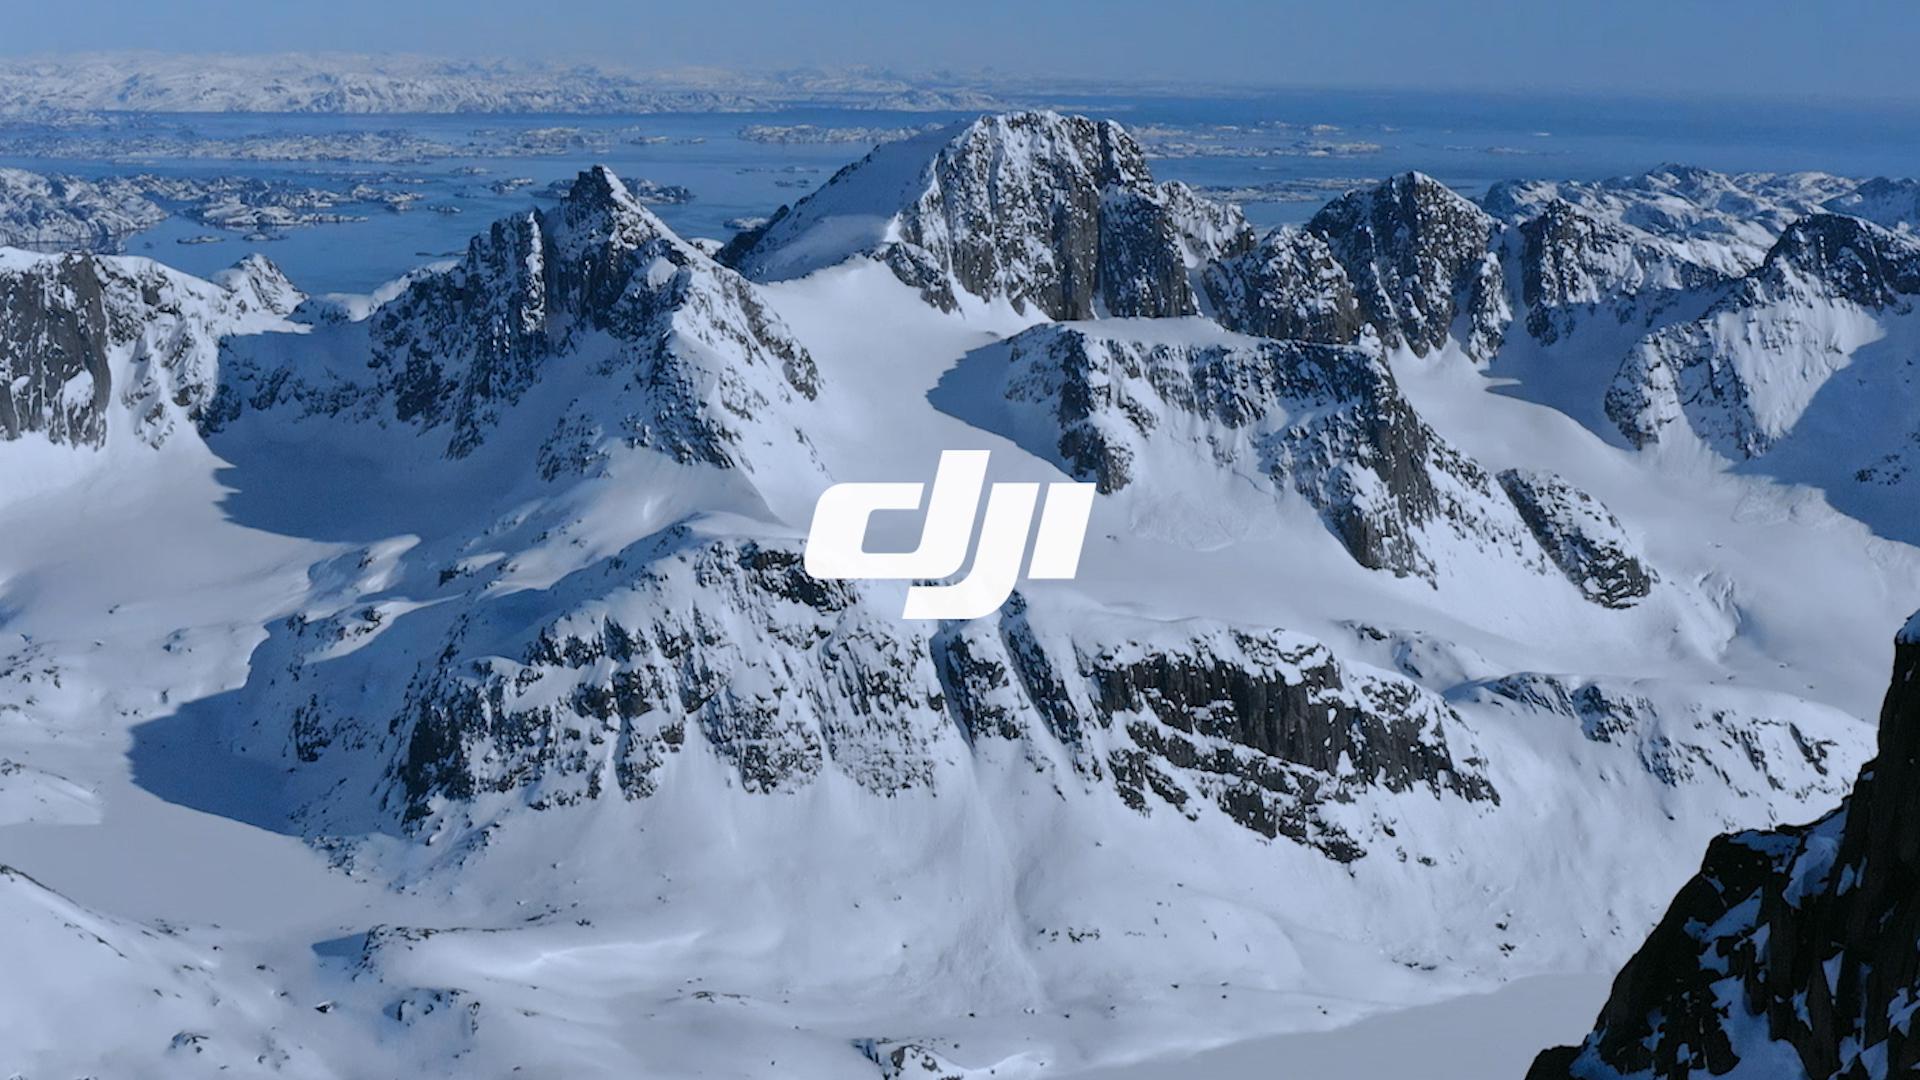 DJI 大疆创新-无畏探索